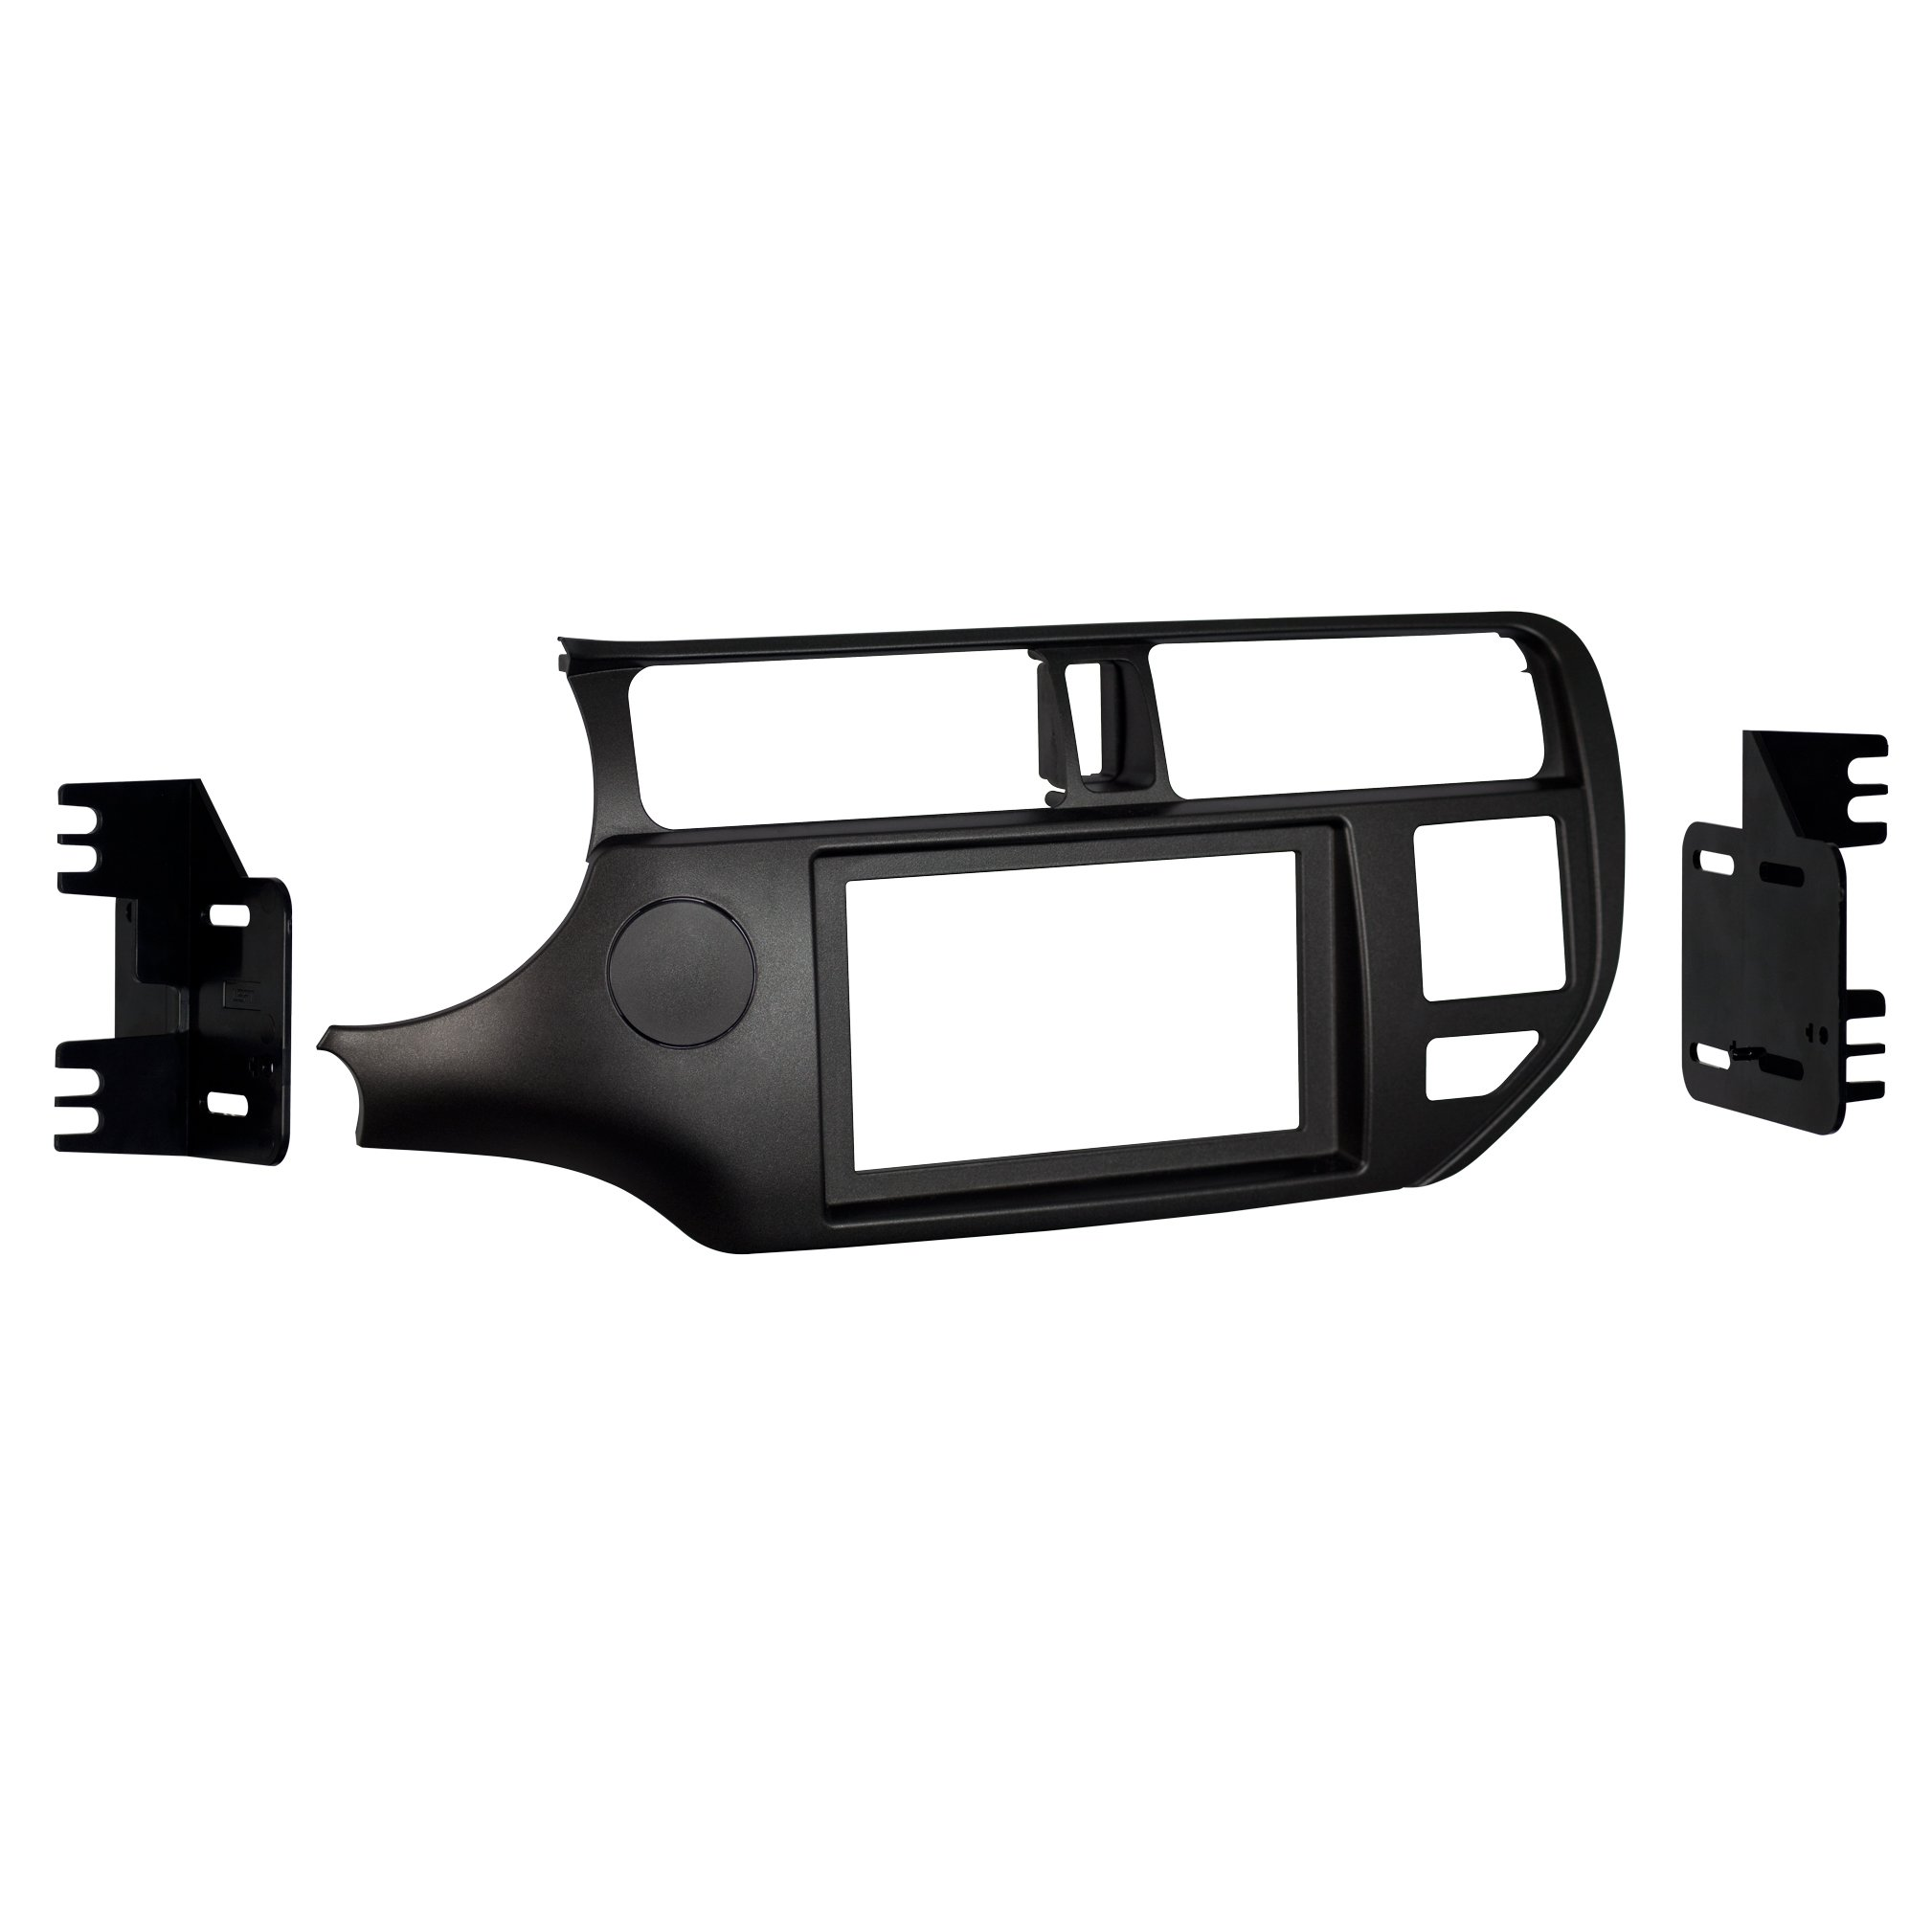 Metra 95-7353CH Double DIN Dash Kit for Select 2012-Up Kia Rio Vehicles (Black)